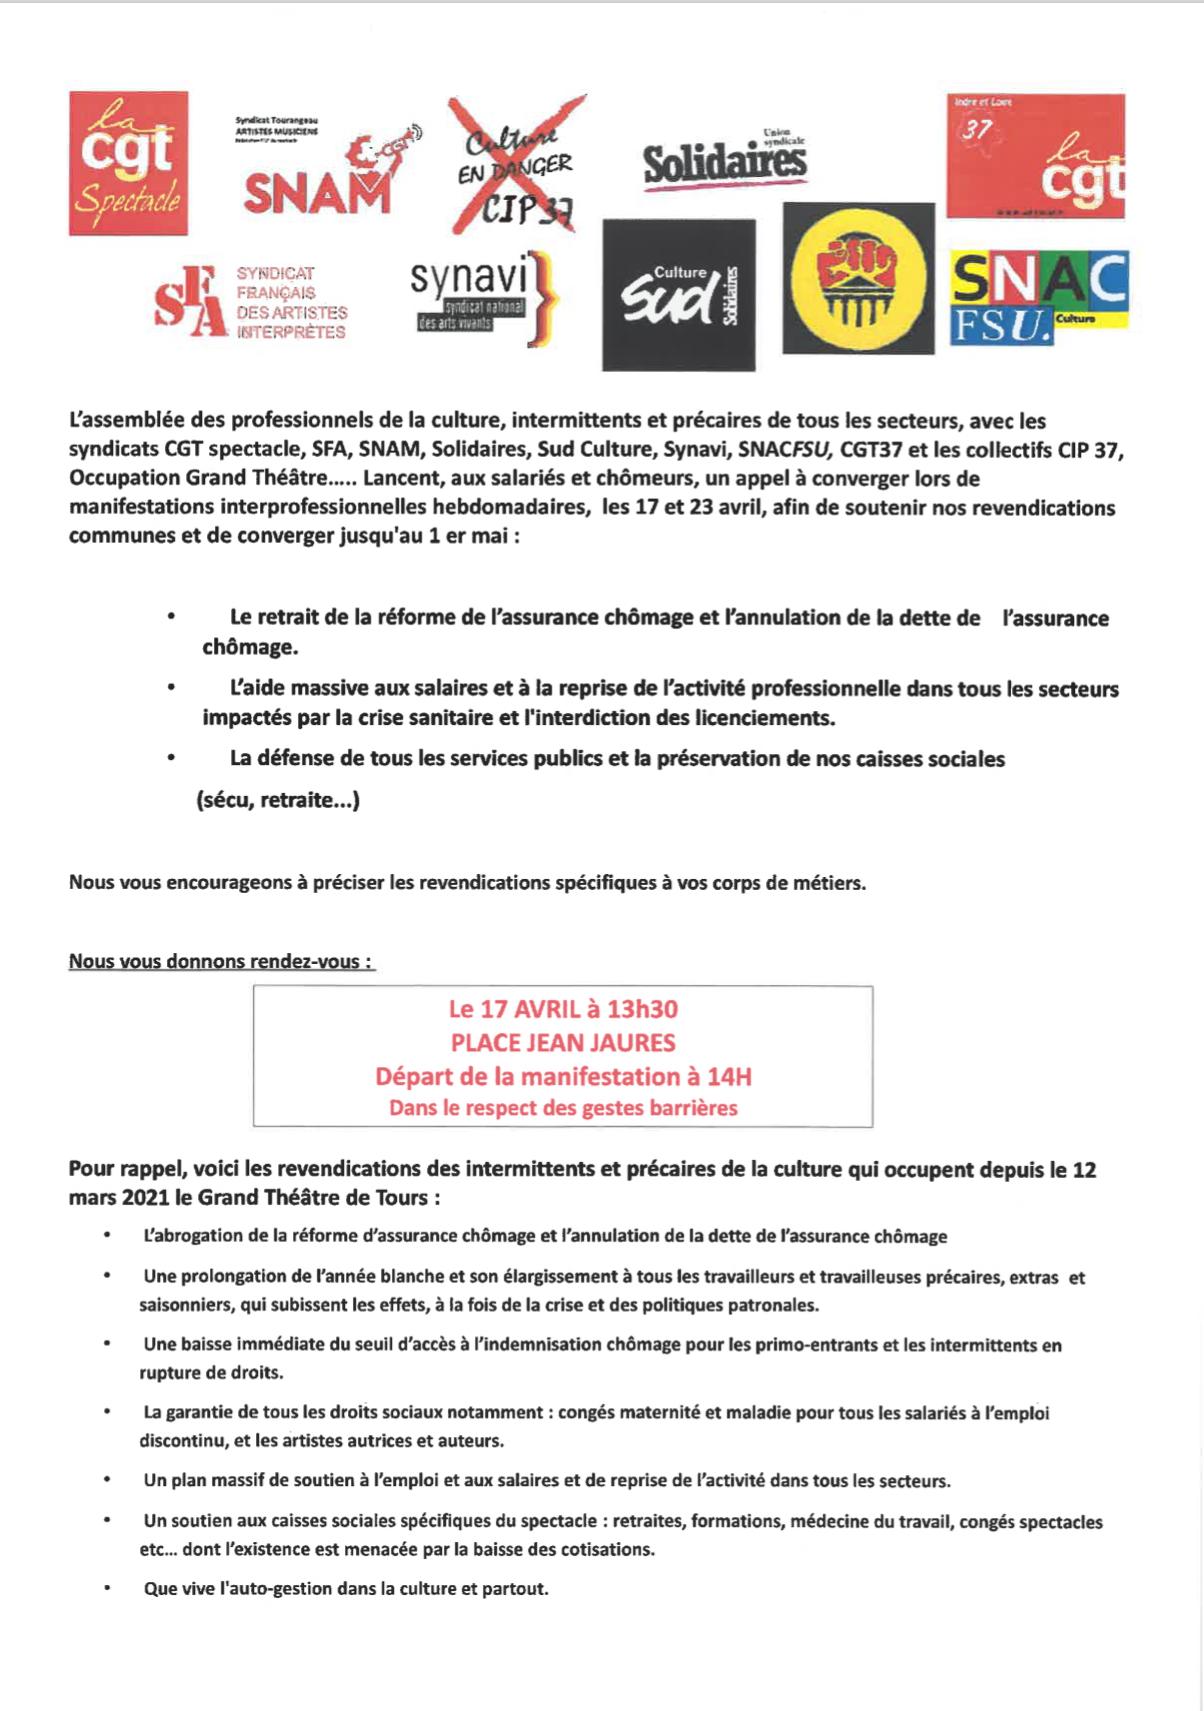 action du 17 et 23 avril 2021